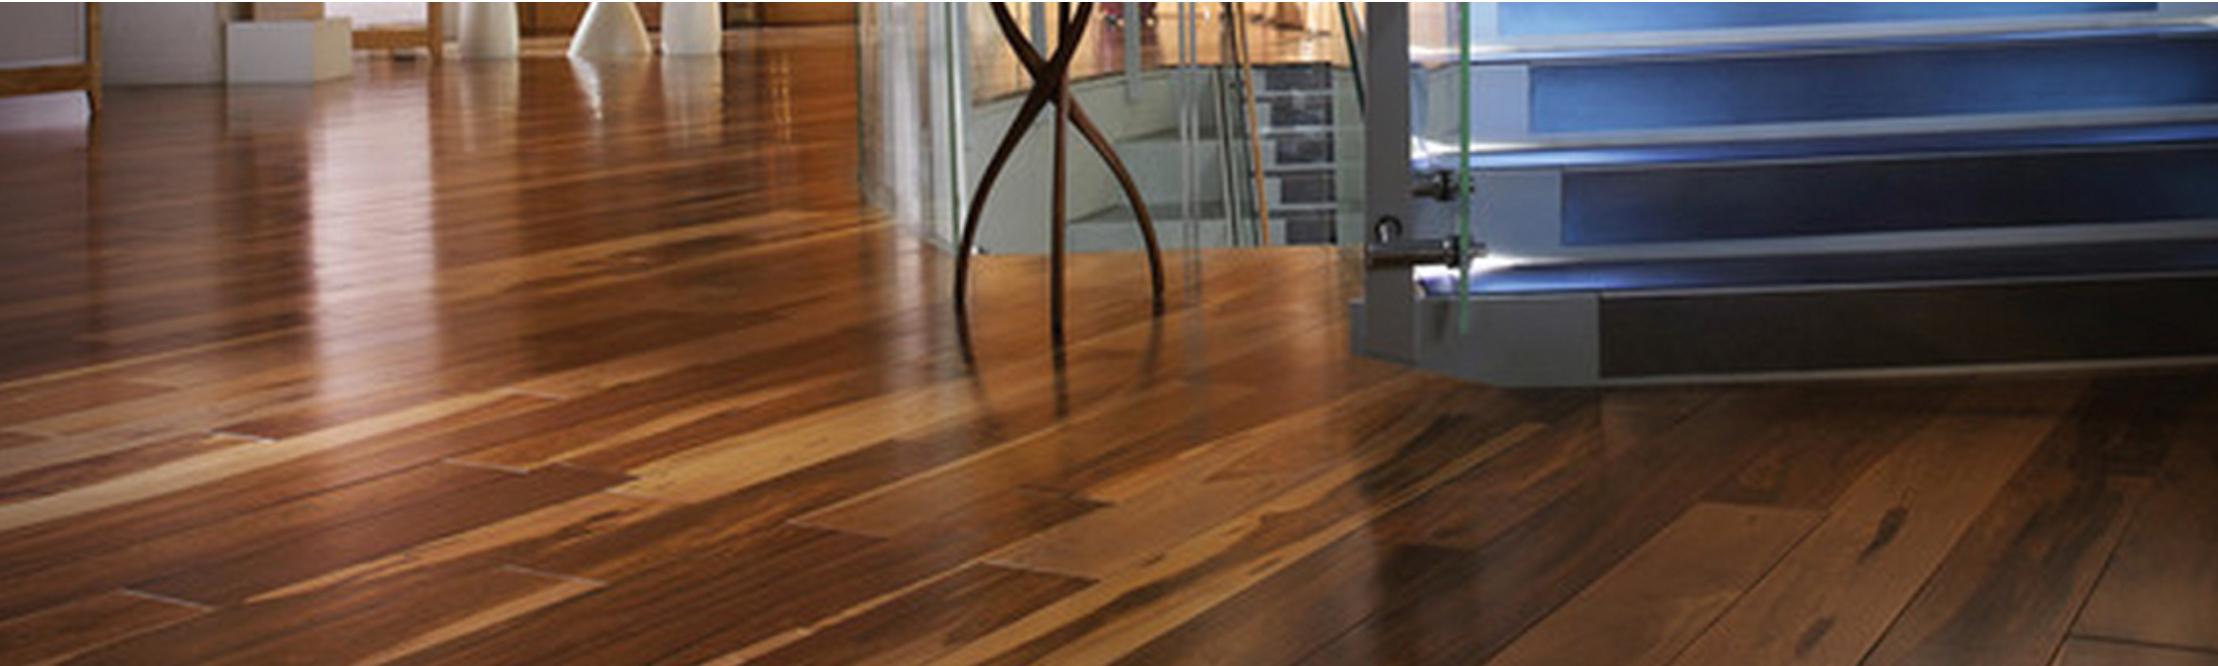 Real Estate Carpet Cleaning Richmond Virginia Va